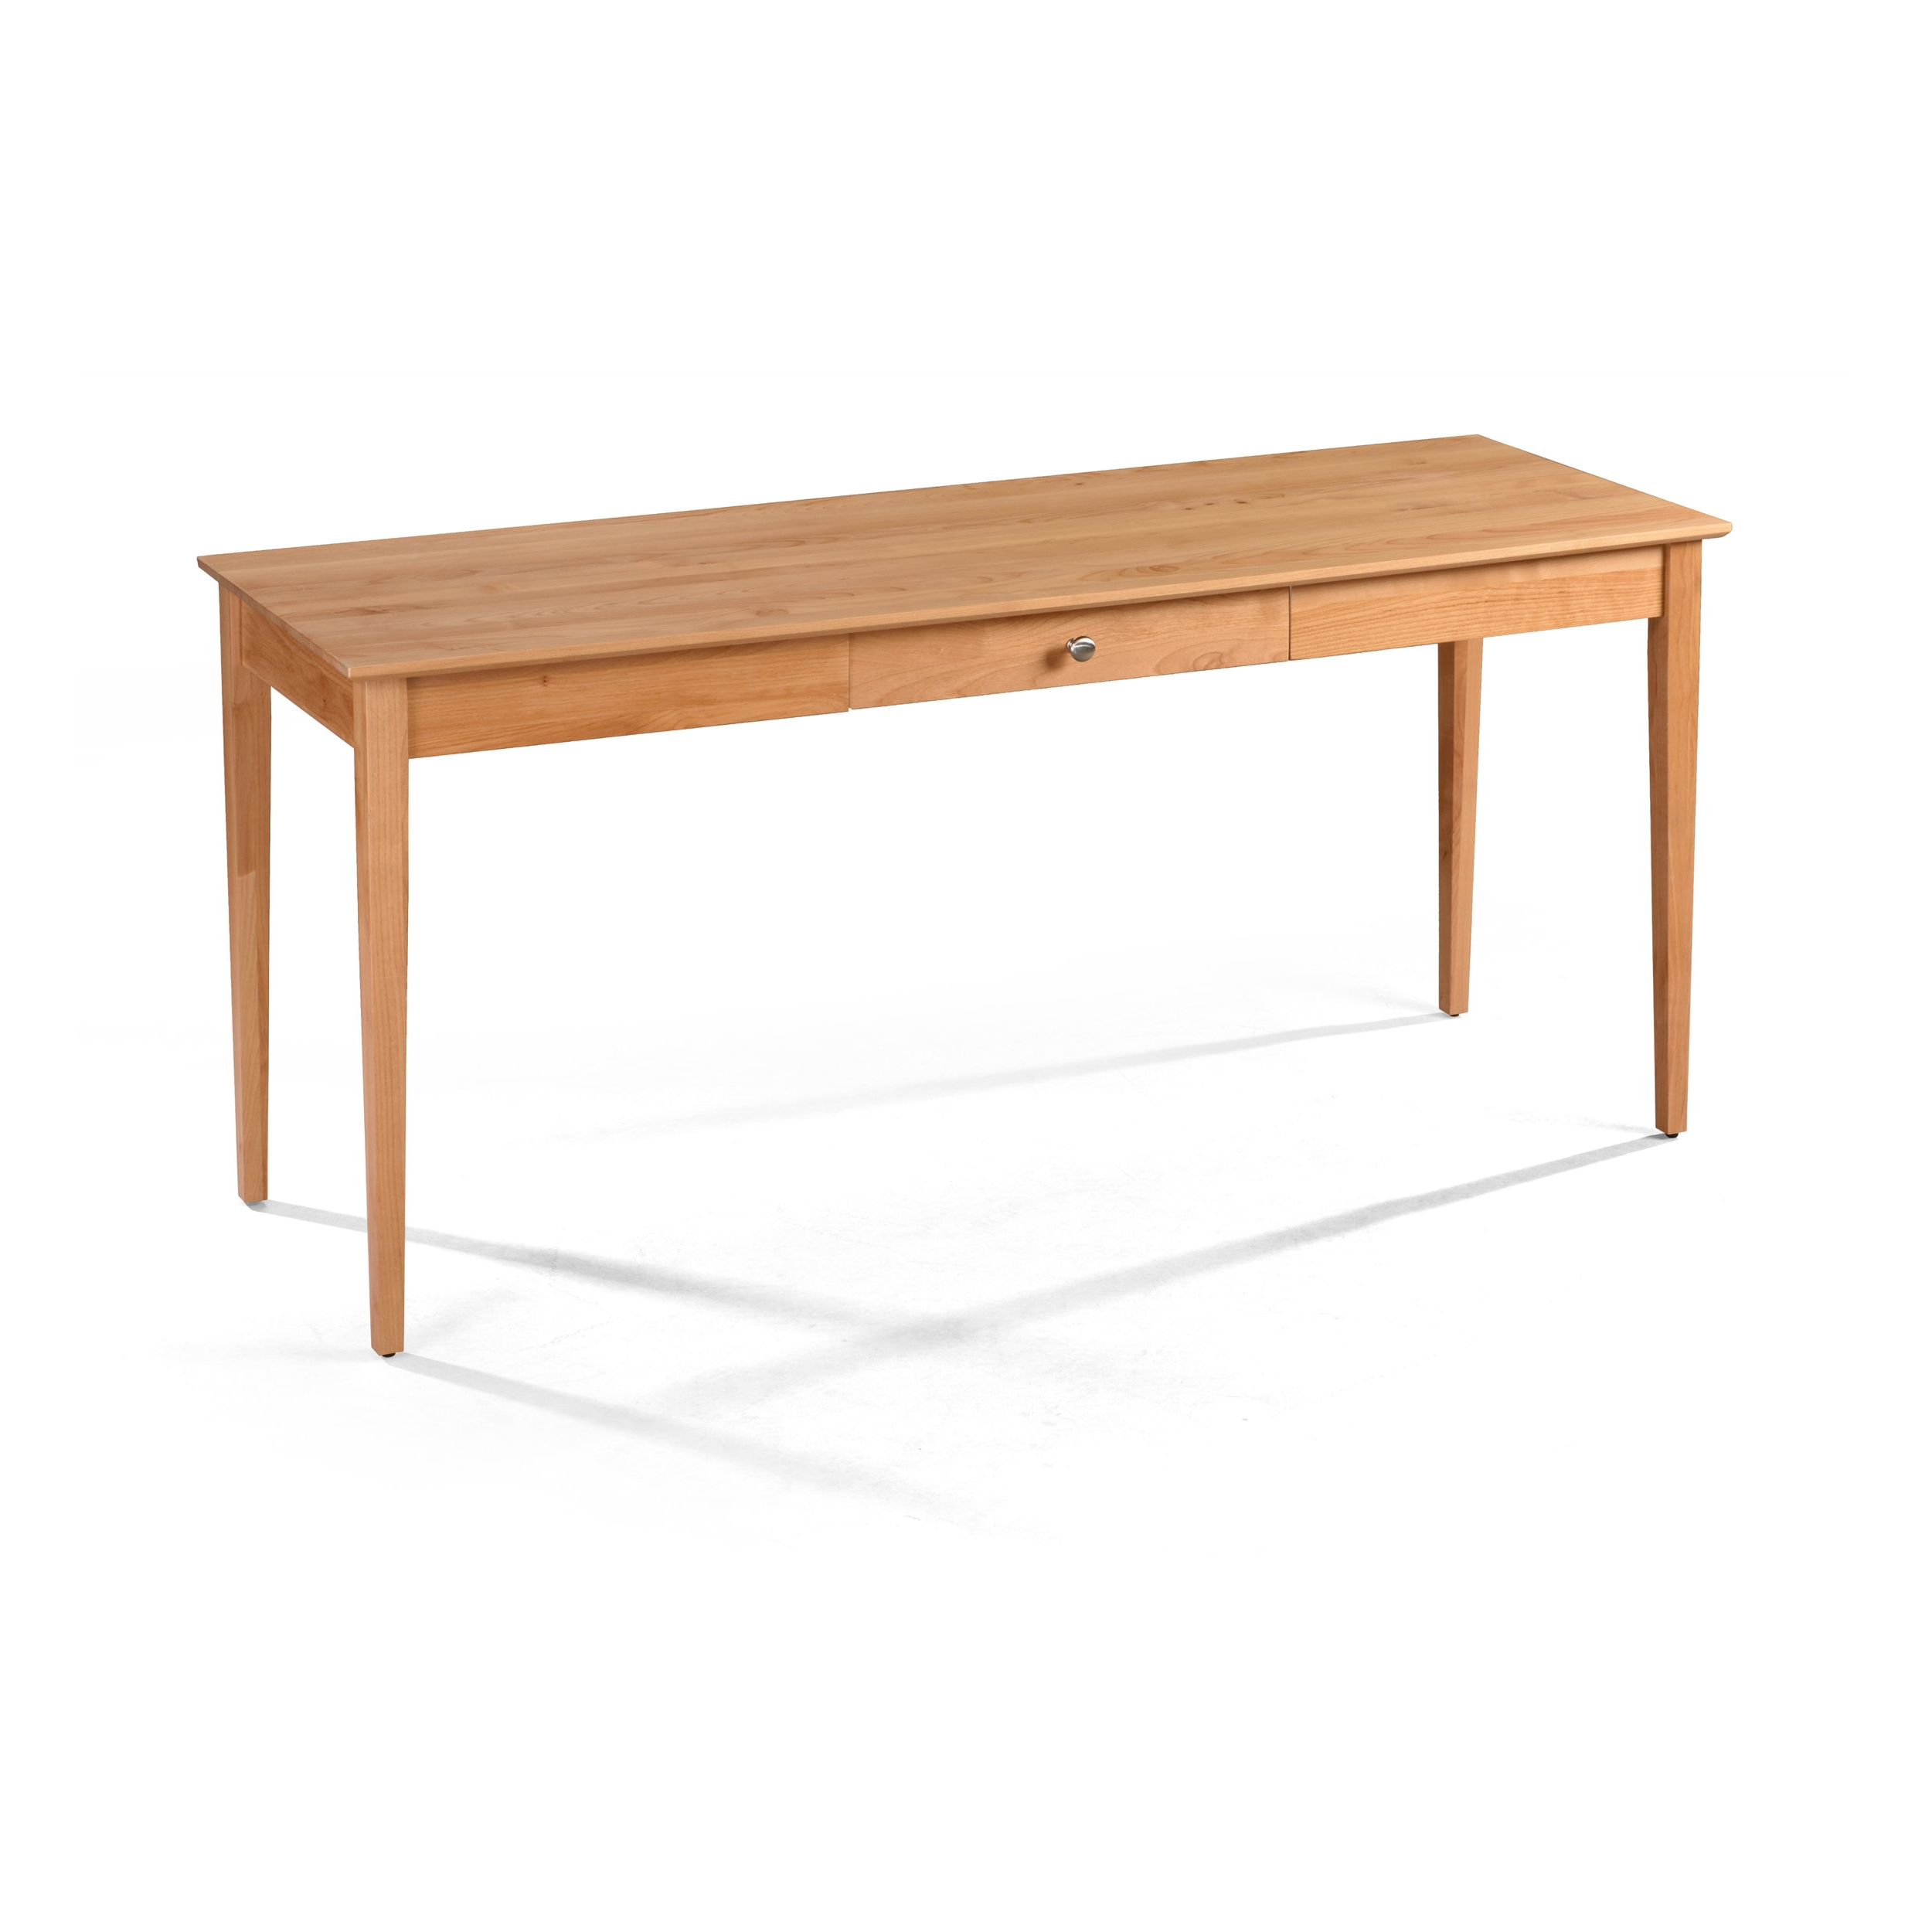 desk - archbold - shaker large writing table - finished natural.jpg